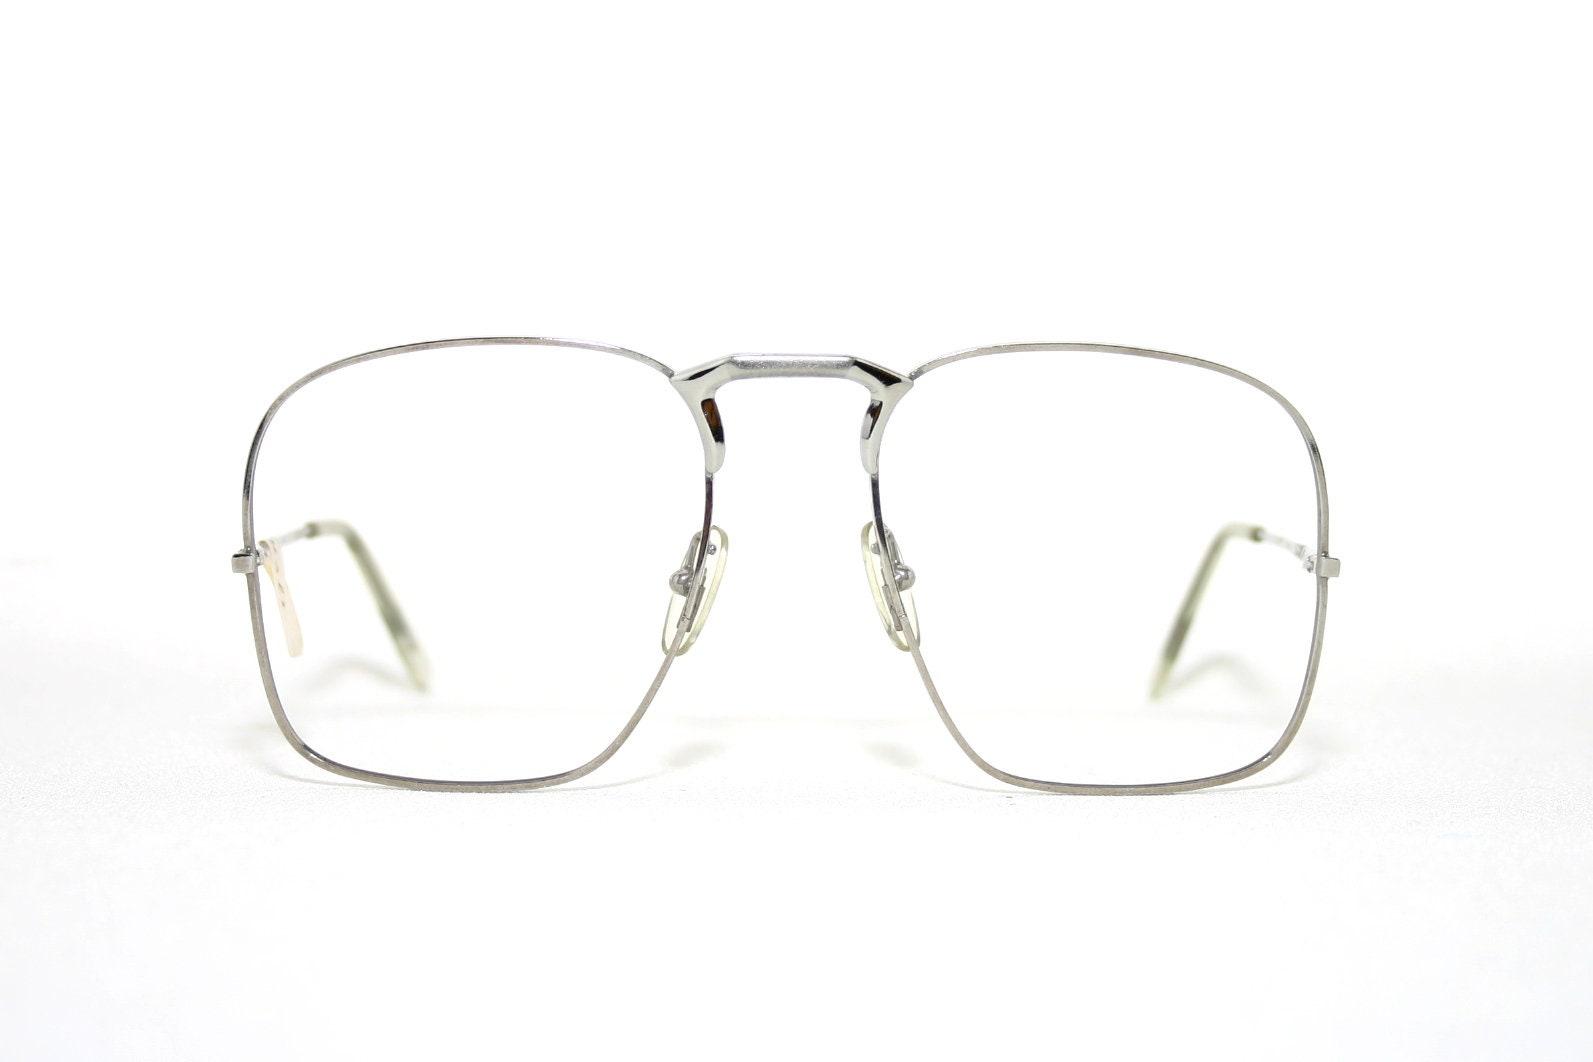 d4c65d88148 Conquistador Square Metal Eyeglasses Big Frame Silver Vintage